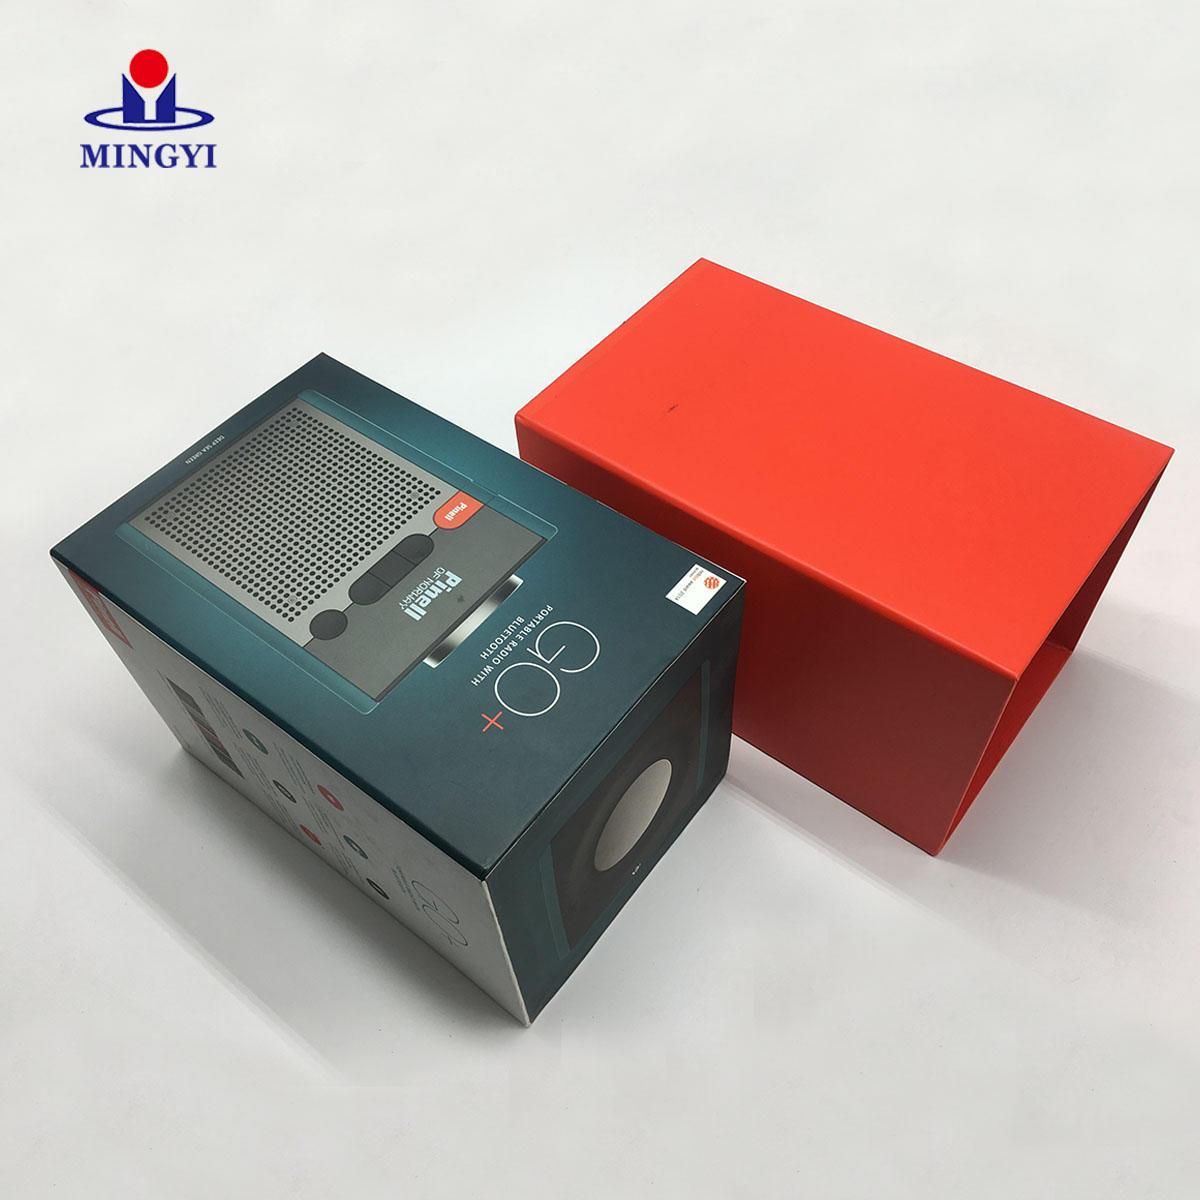 window ceremony eva design watch gift box Mingyi Printing-Mingyi Printing-img-1